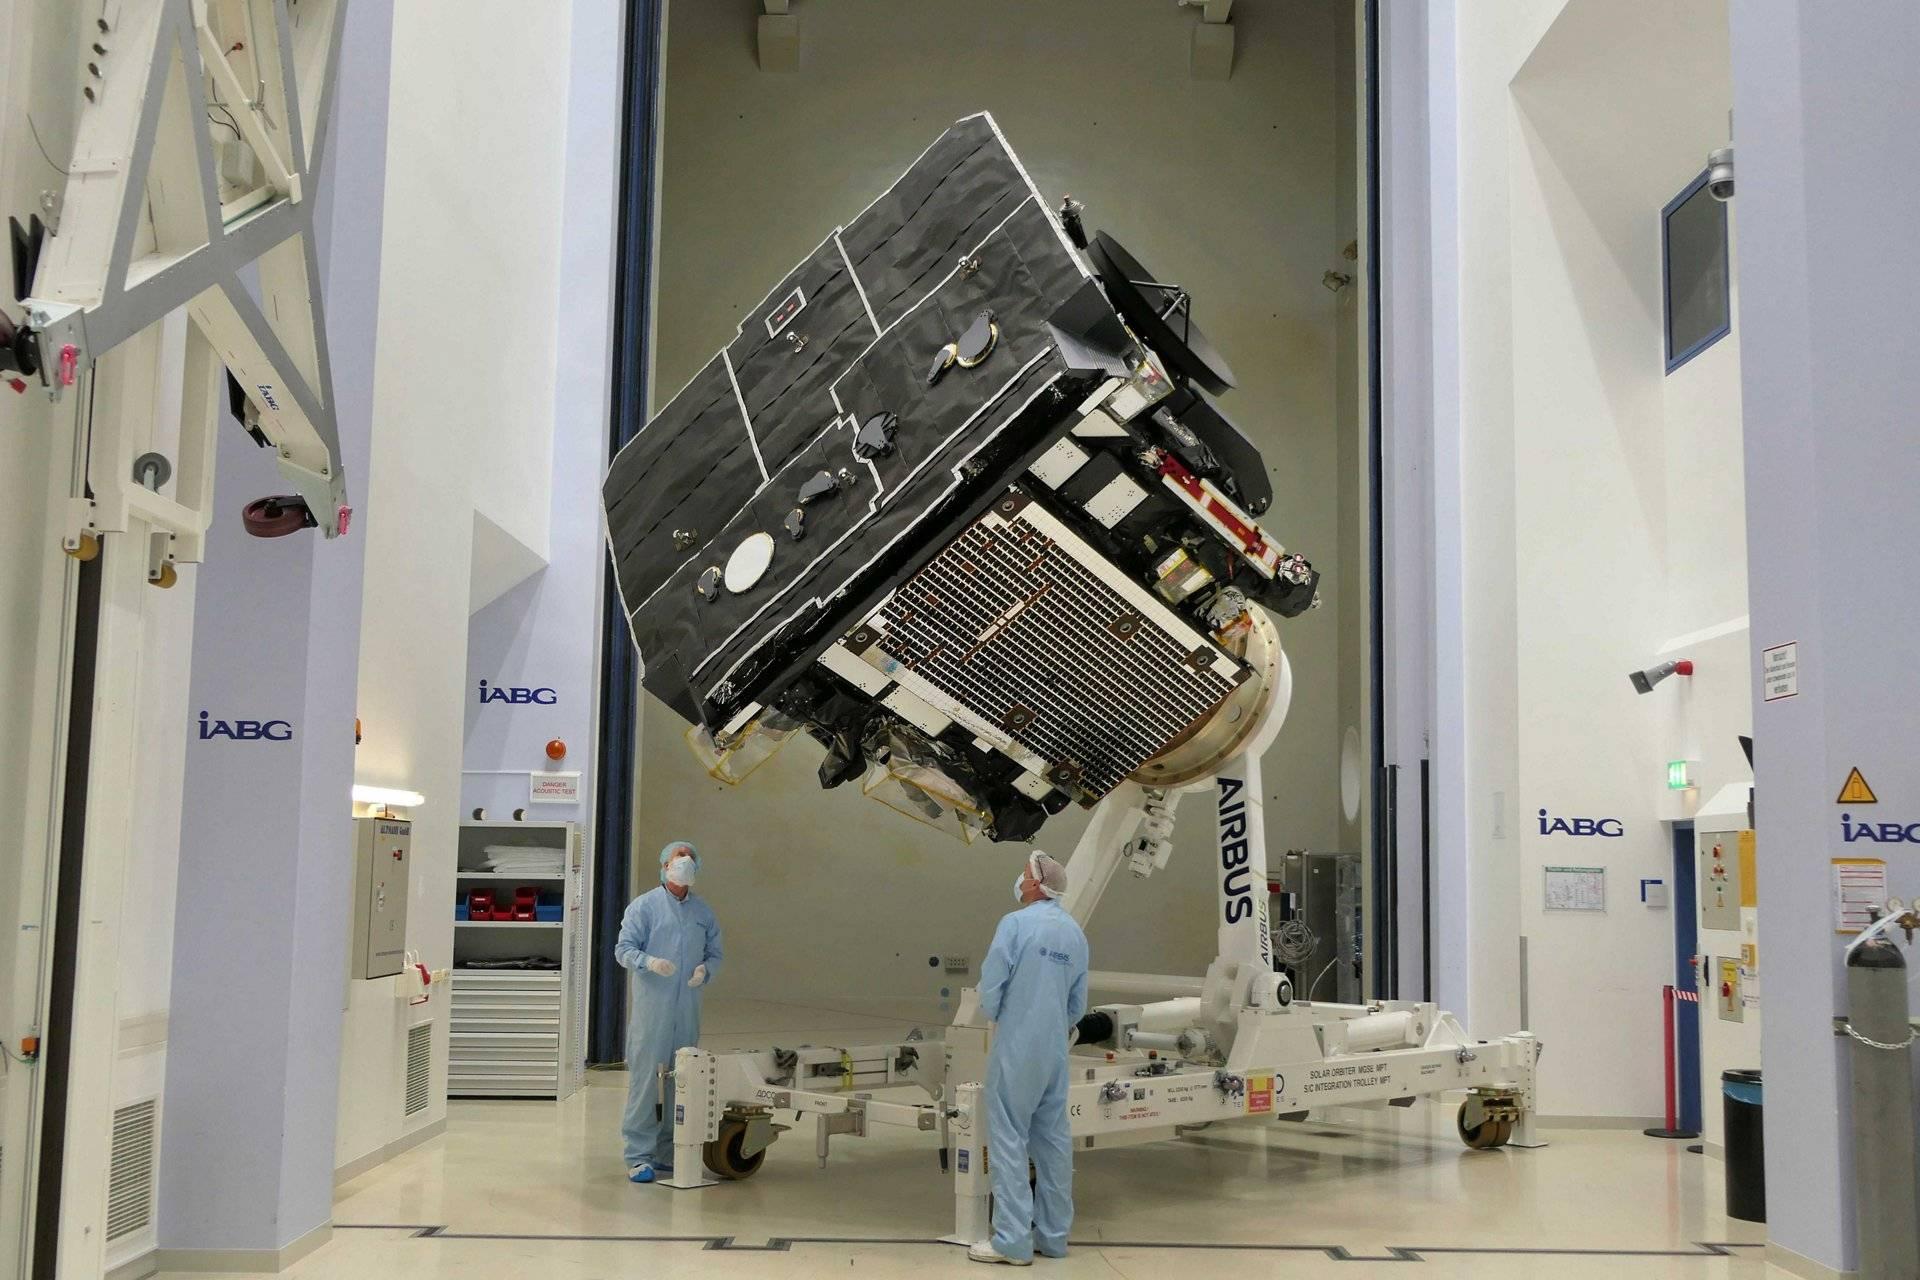 sonda espacial Solar Orbiter